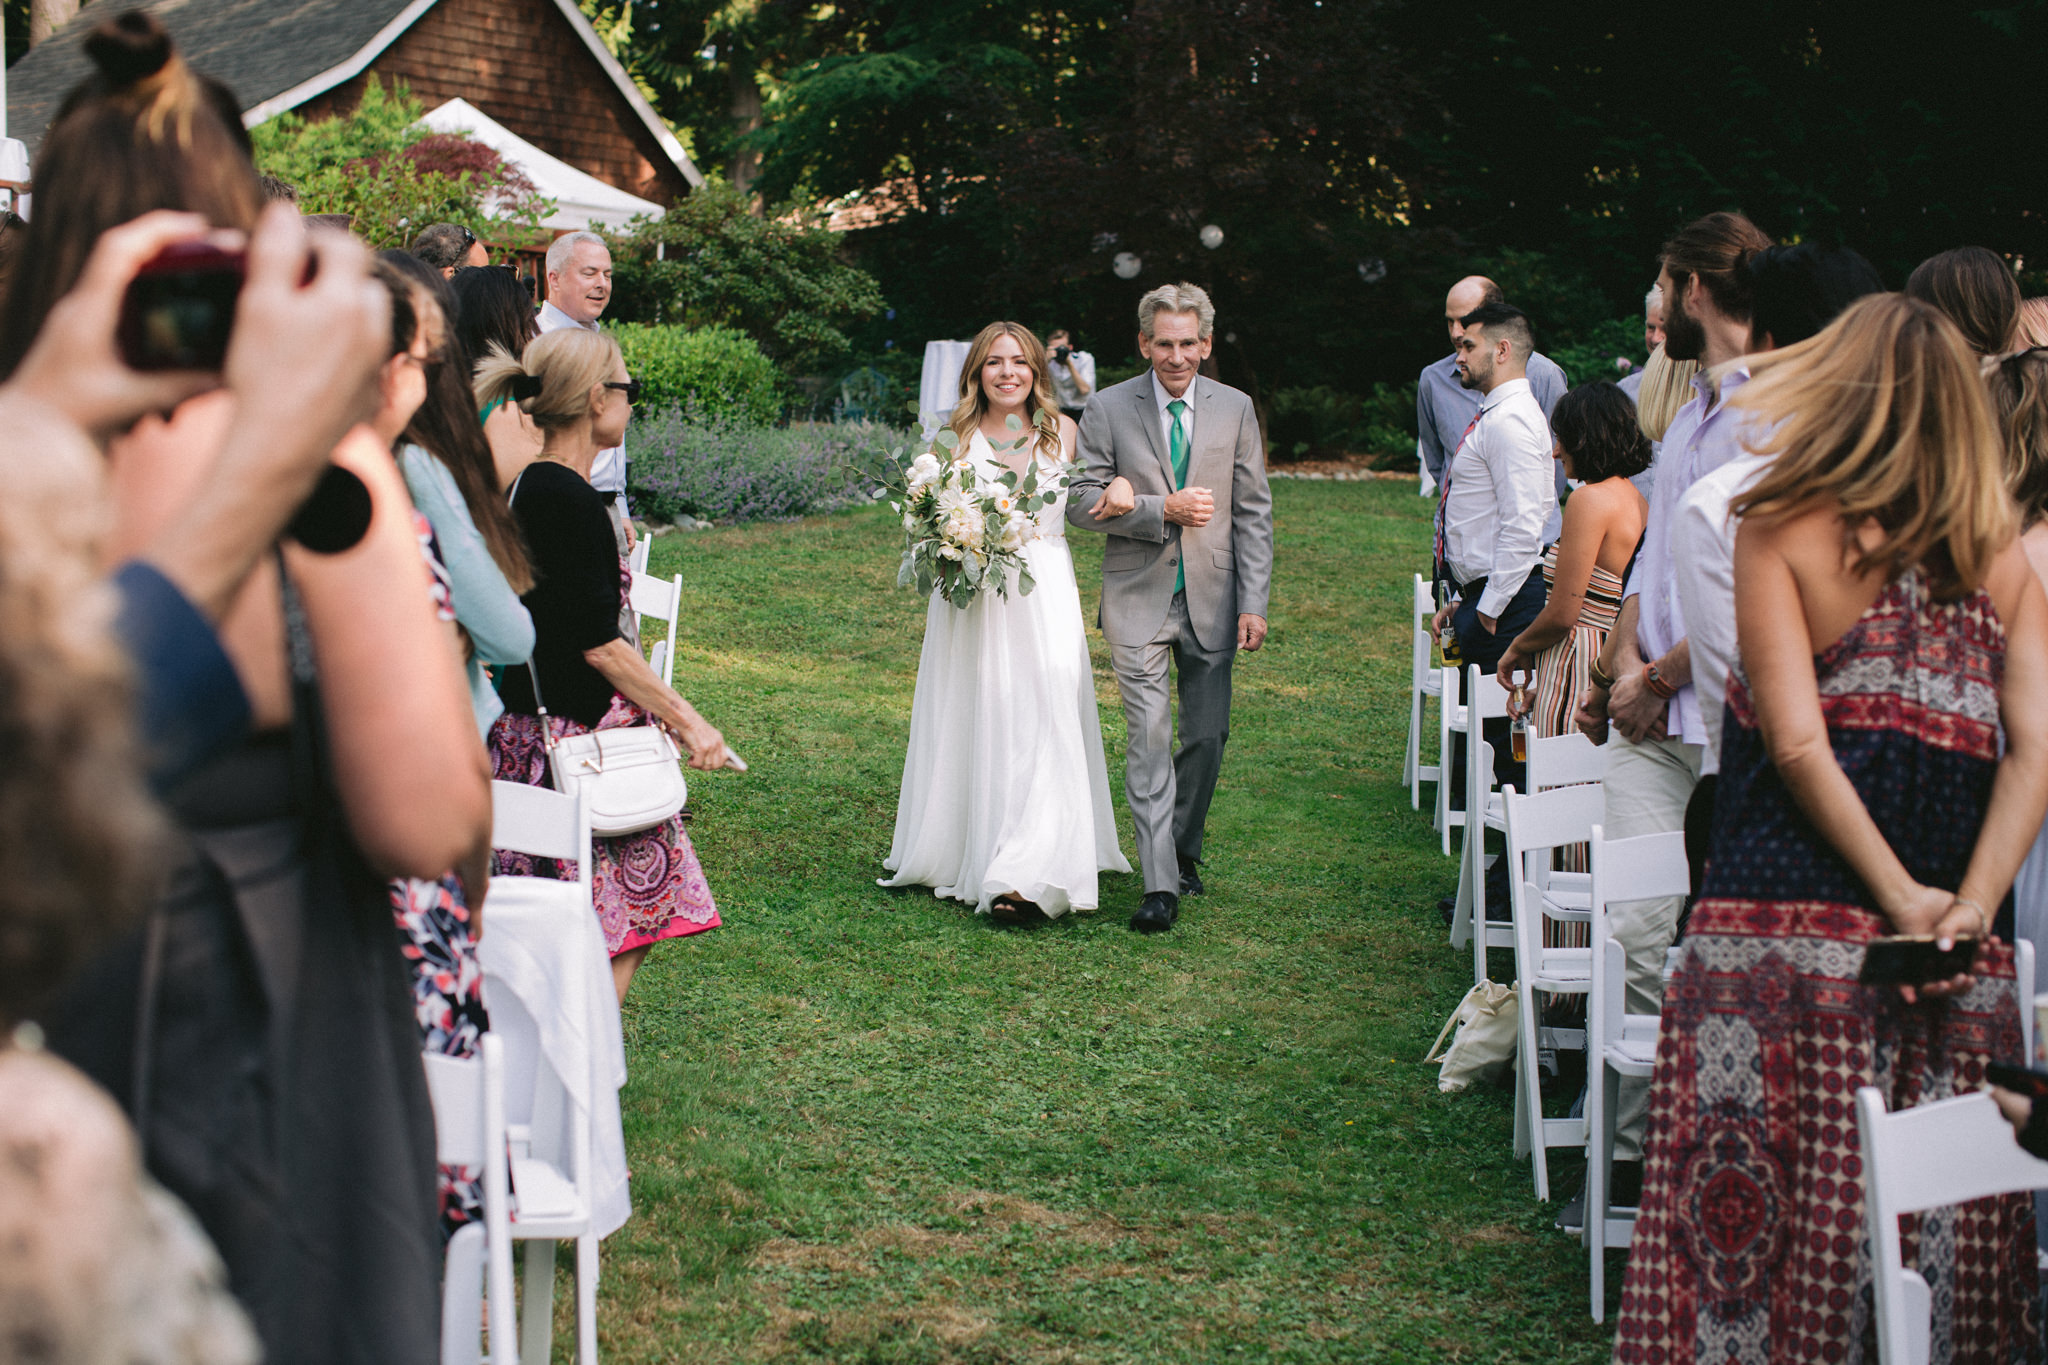 Backyard-Bainbridge-Island-Wedding-Alycia-Lovell-Photography-86.JPG